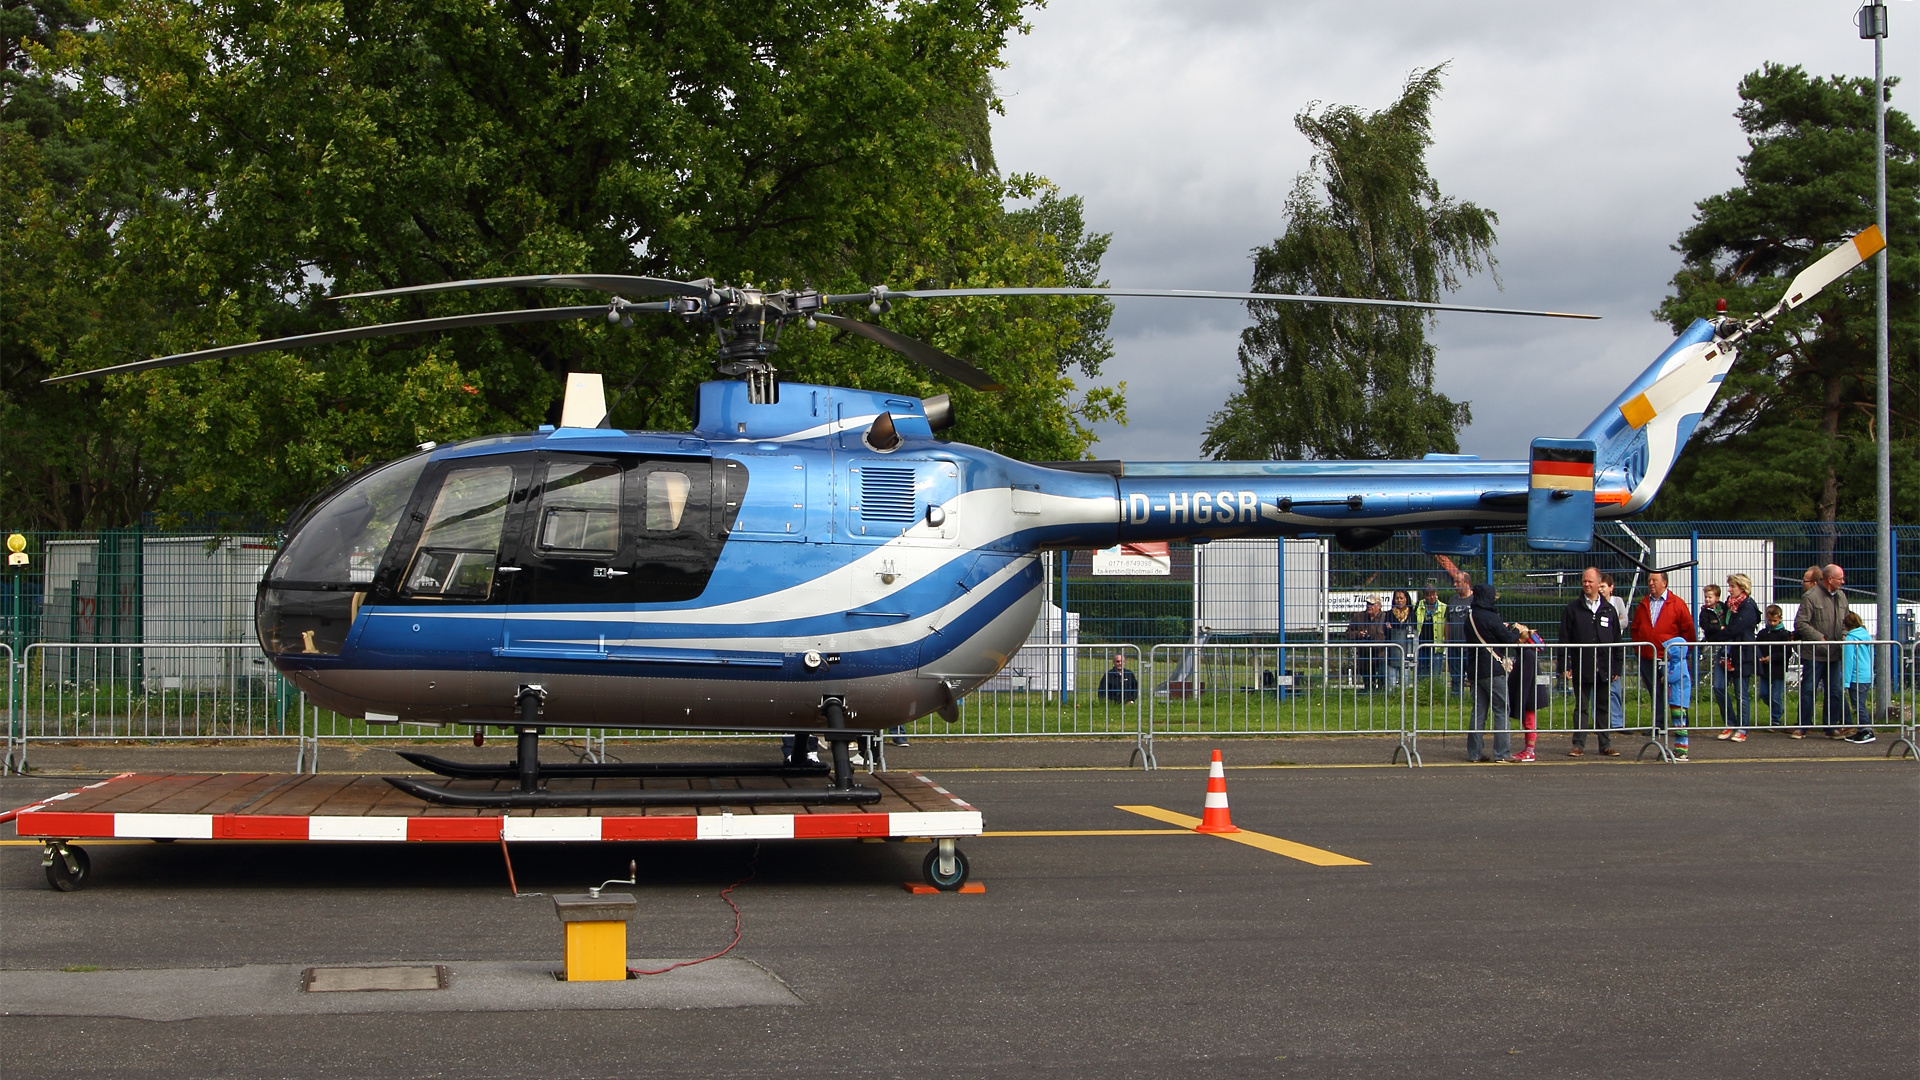 D-HGSR-2 BO105 ESS 201412